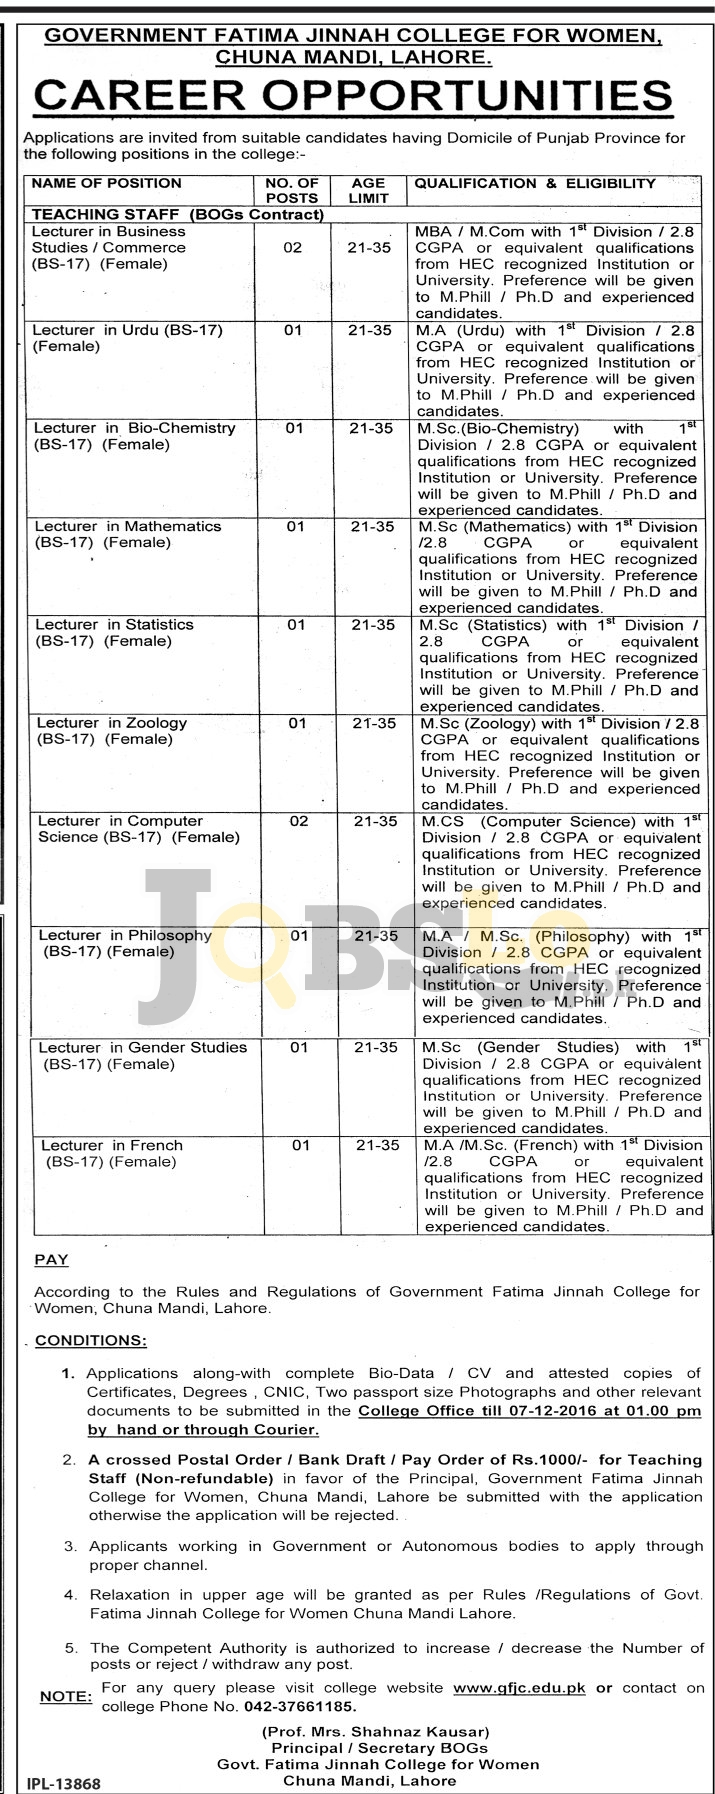 Govt Fatima Jinnah College Chuna Mandi Lahore Jobs 2016 Career Opportunities